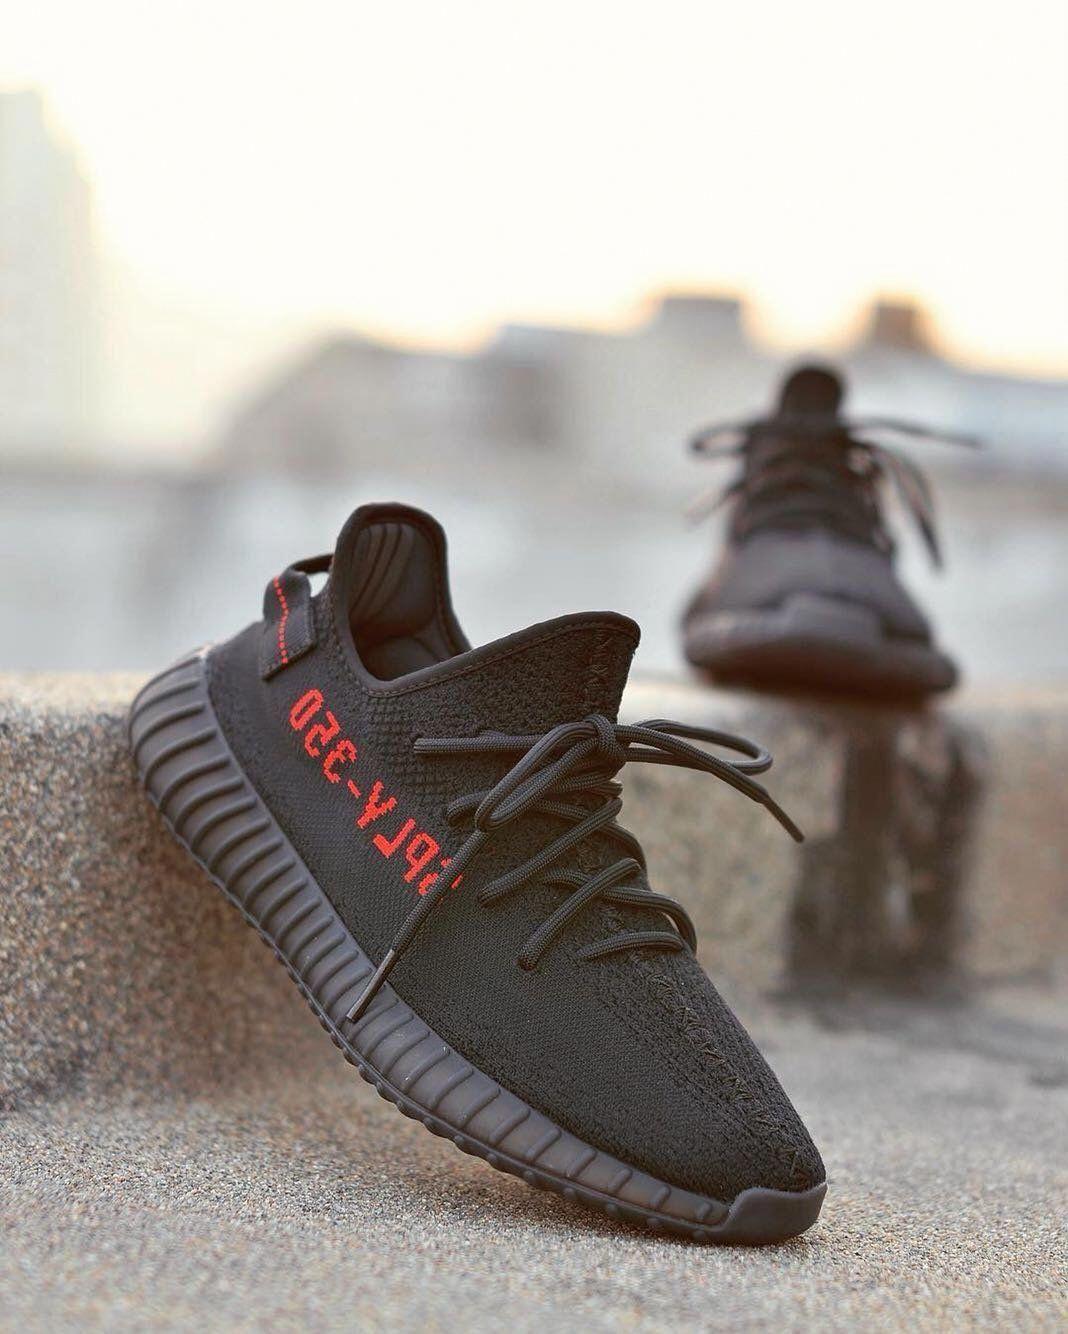 adidas yeezy pirate black v2